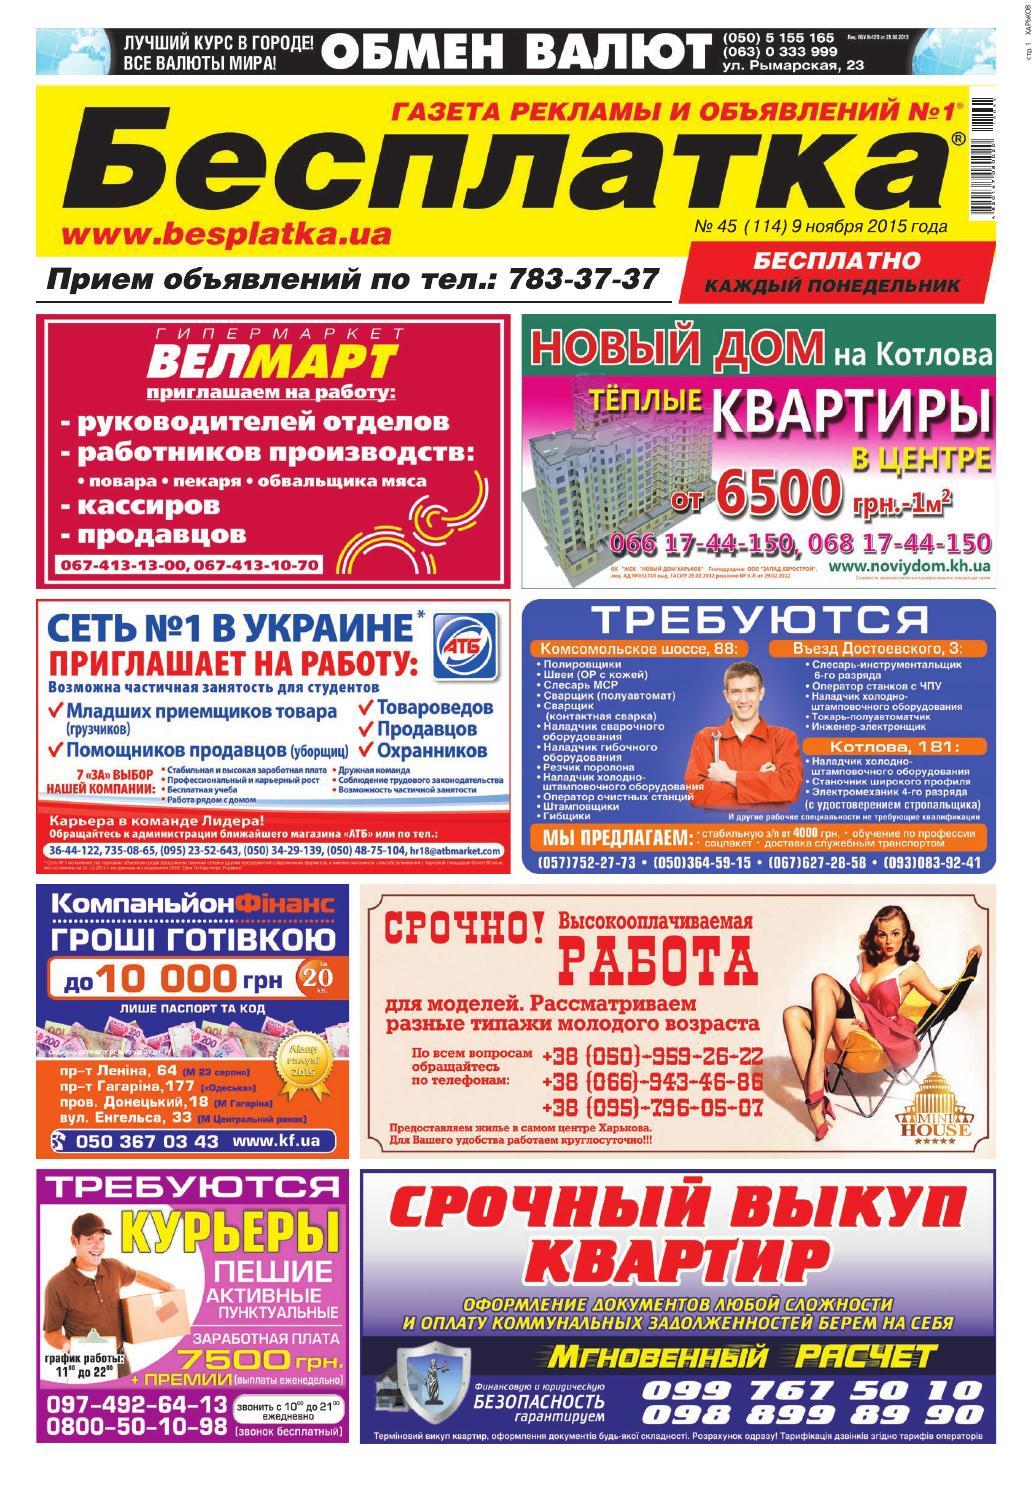 Besplatka  45 Харьков by besplatka ukraine - issuu 8fa4c1d6c41